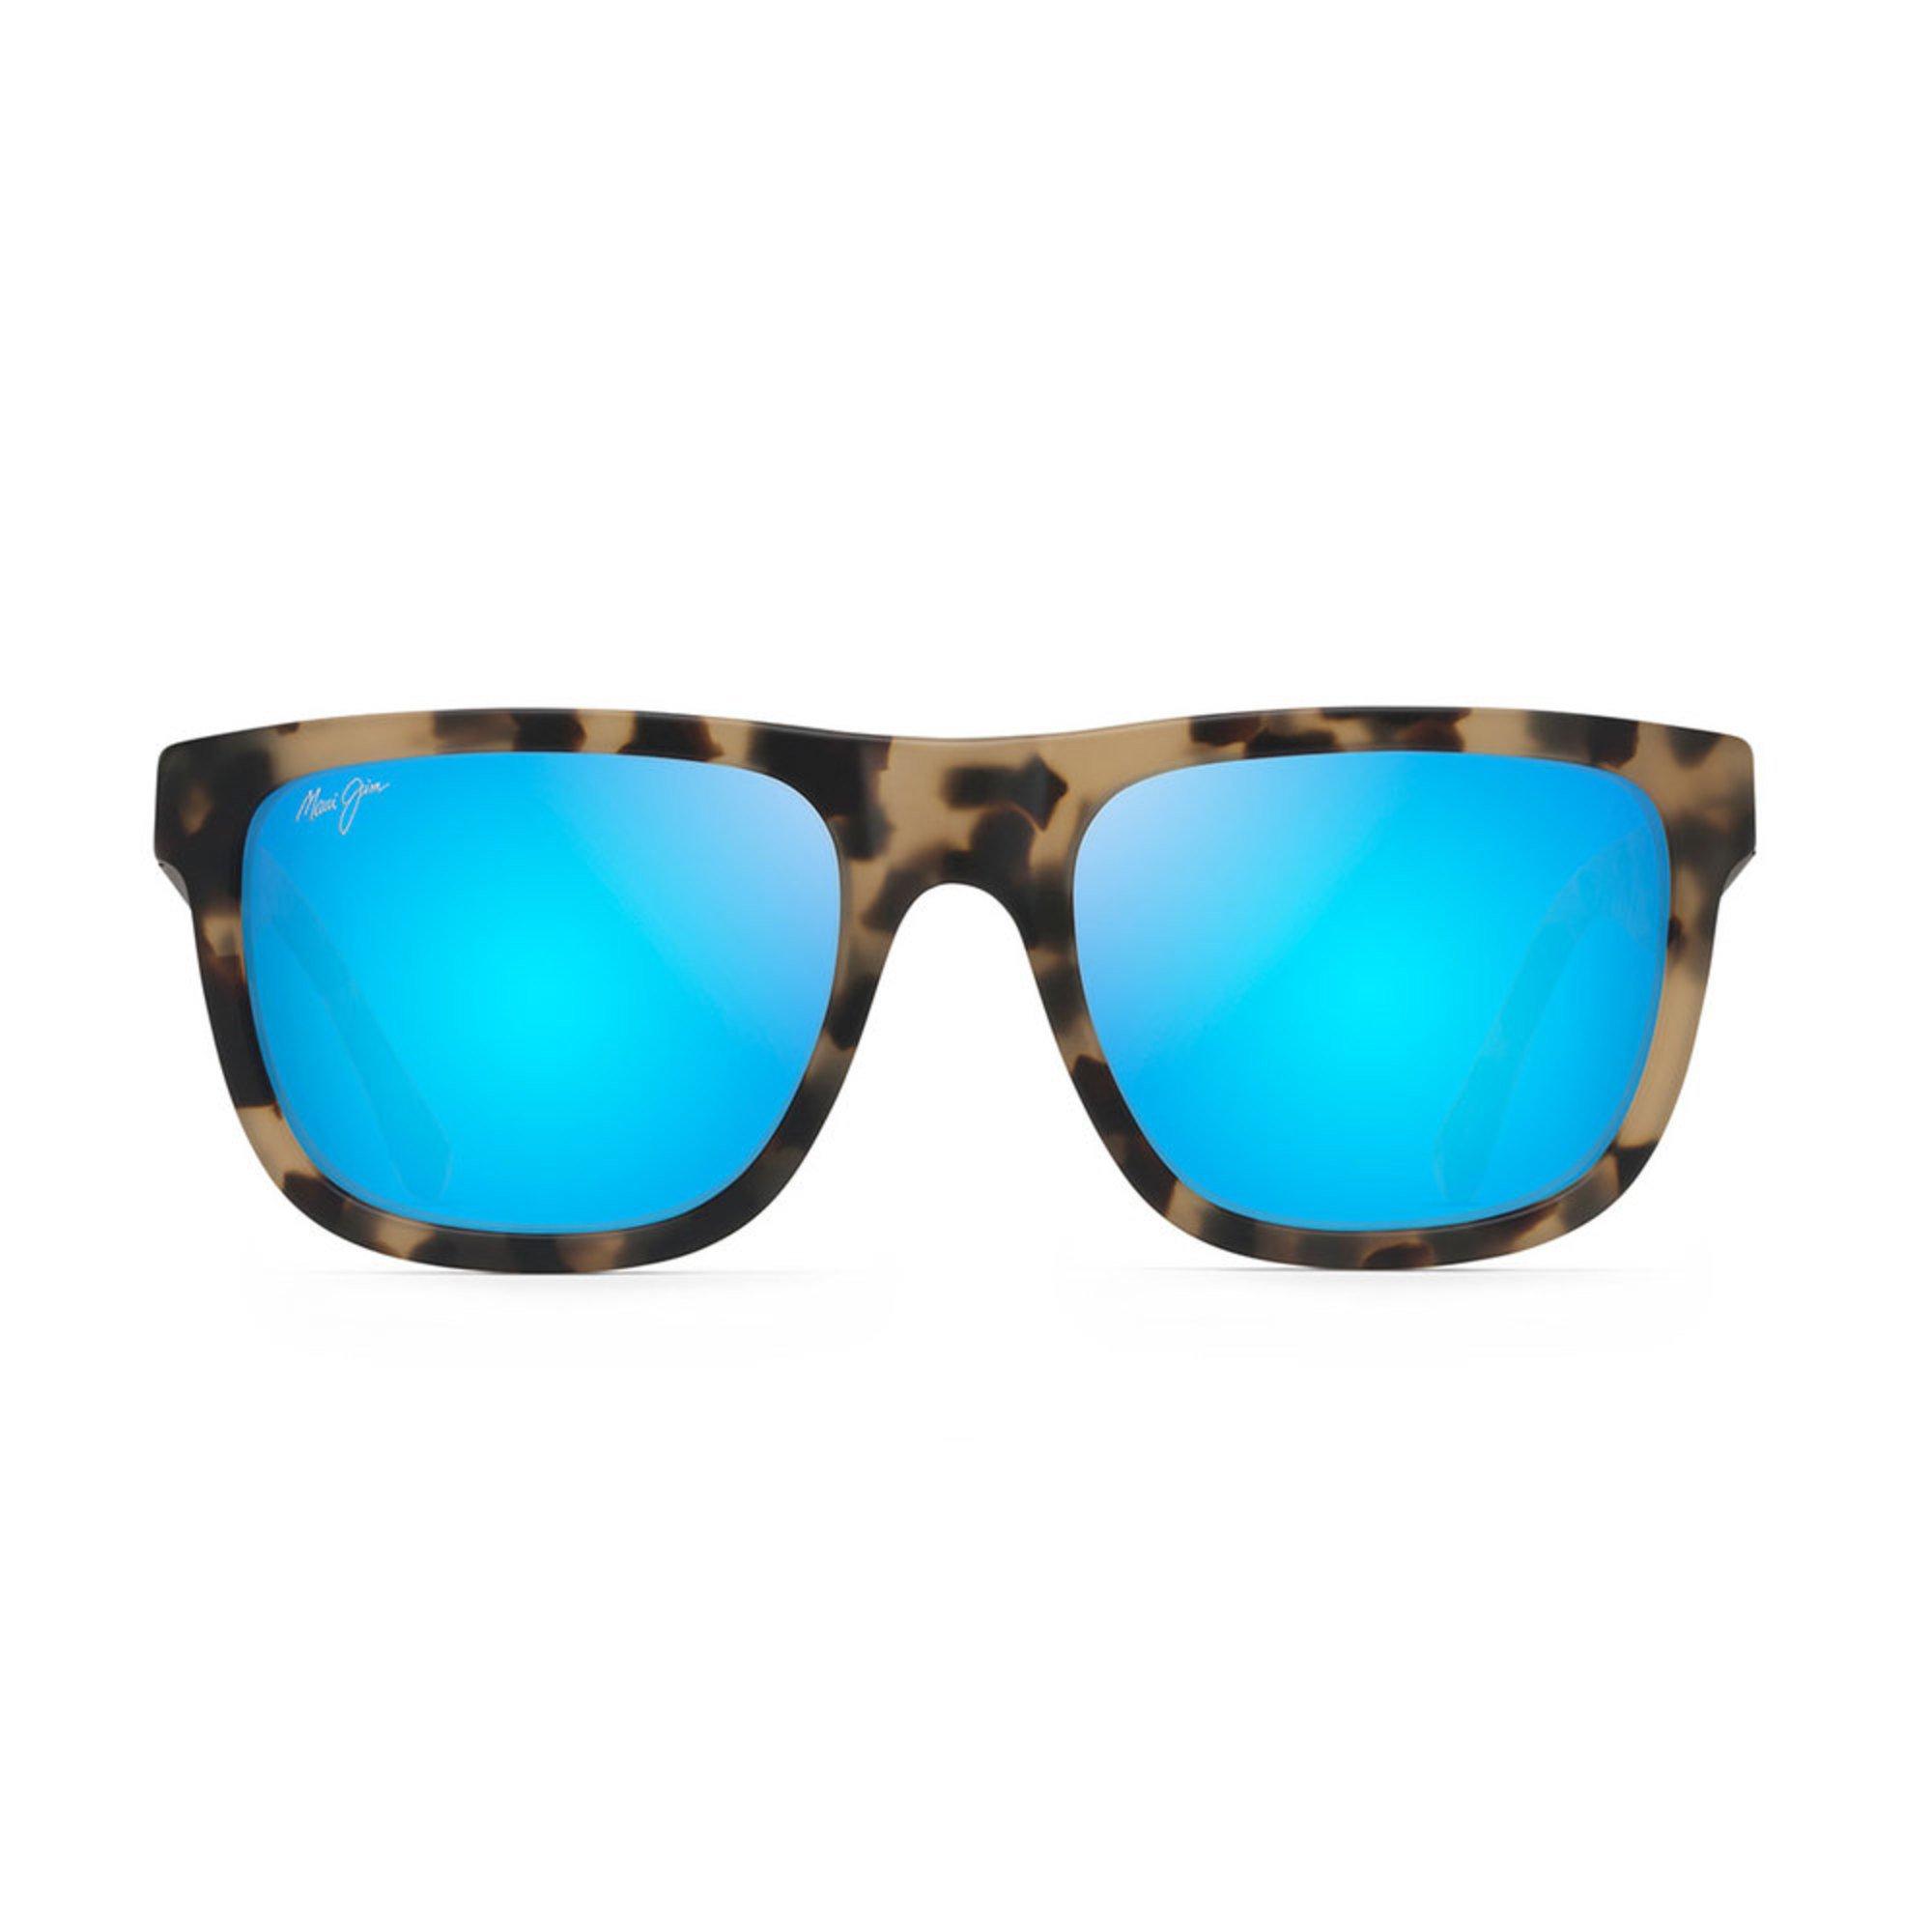 a5402c81089 Maui Jim Unisex Talk Story Matte Tokyo Tortoise Polarized Classic Sunglasses